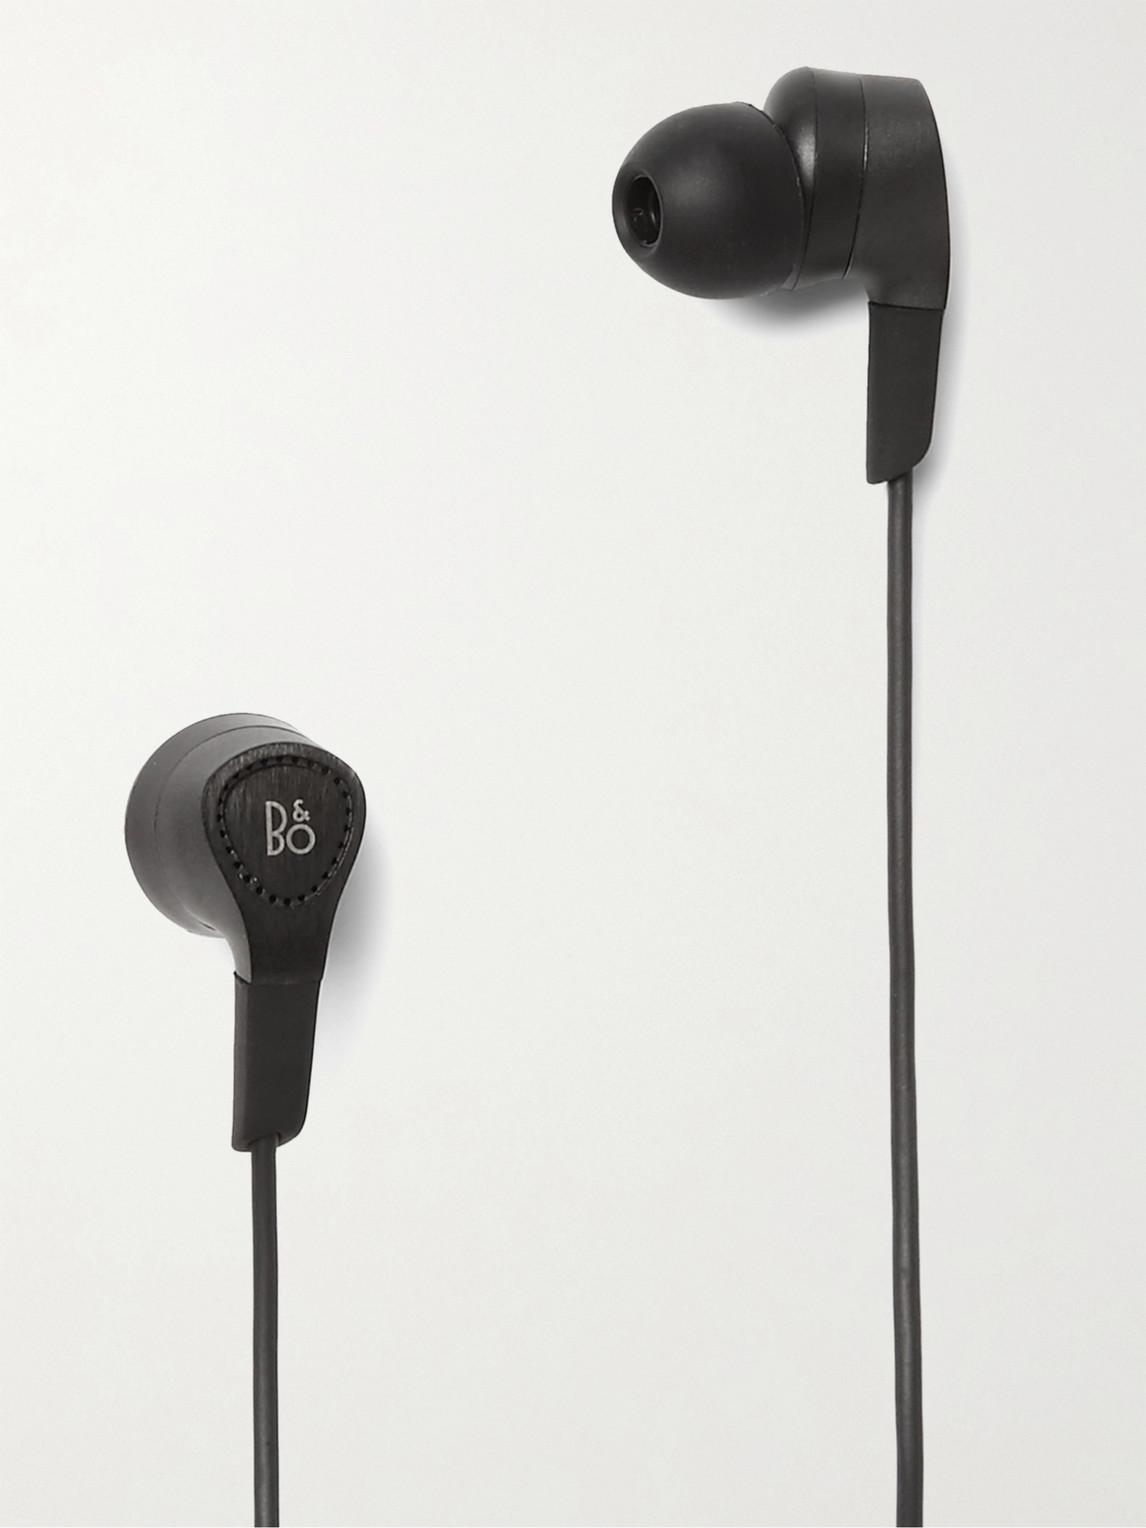 bang amp; olufsen - h3 earphones - black - men